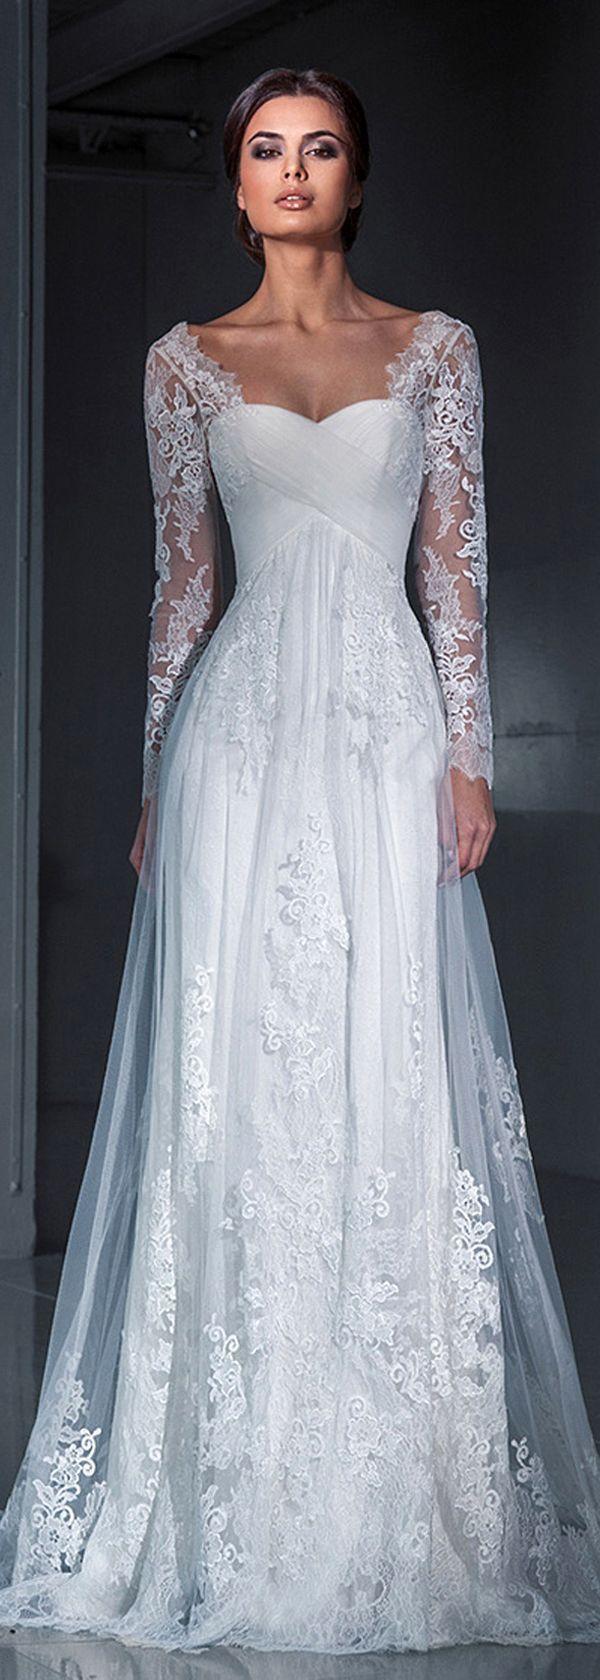 978 mejores imágenes de wedding dresses en Pinterest   Vestidos de ...